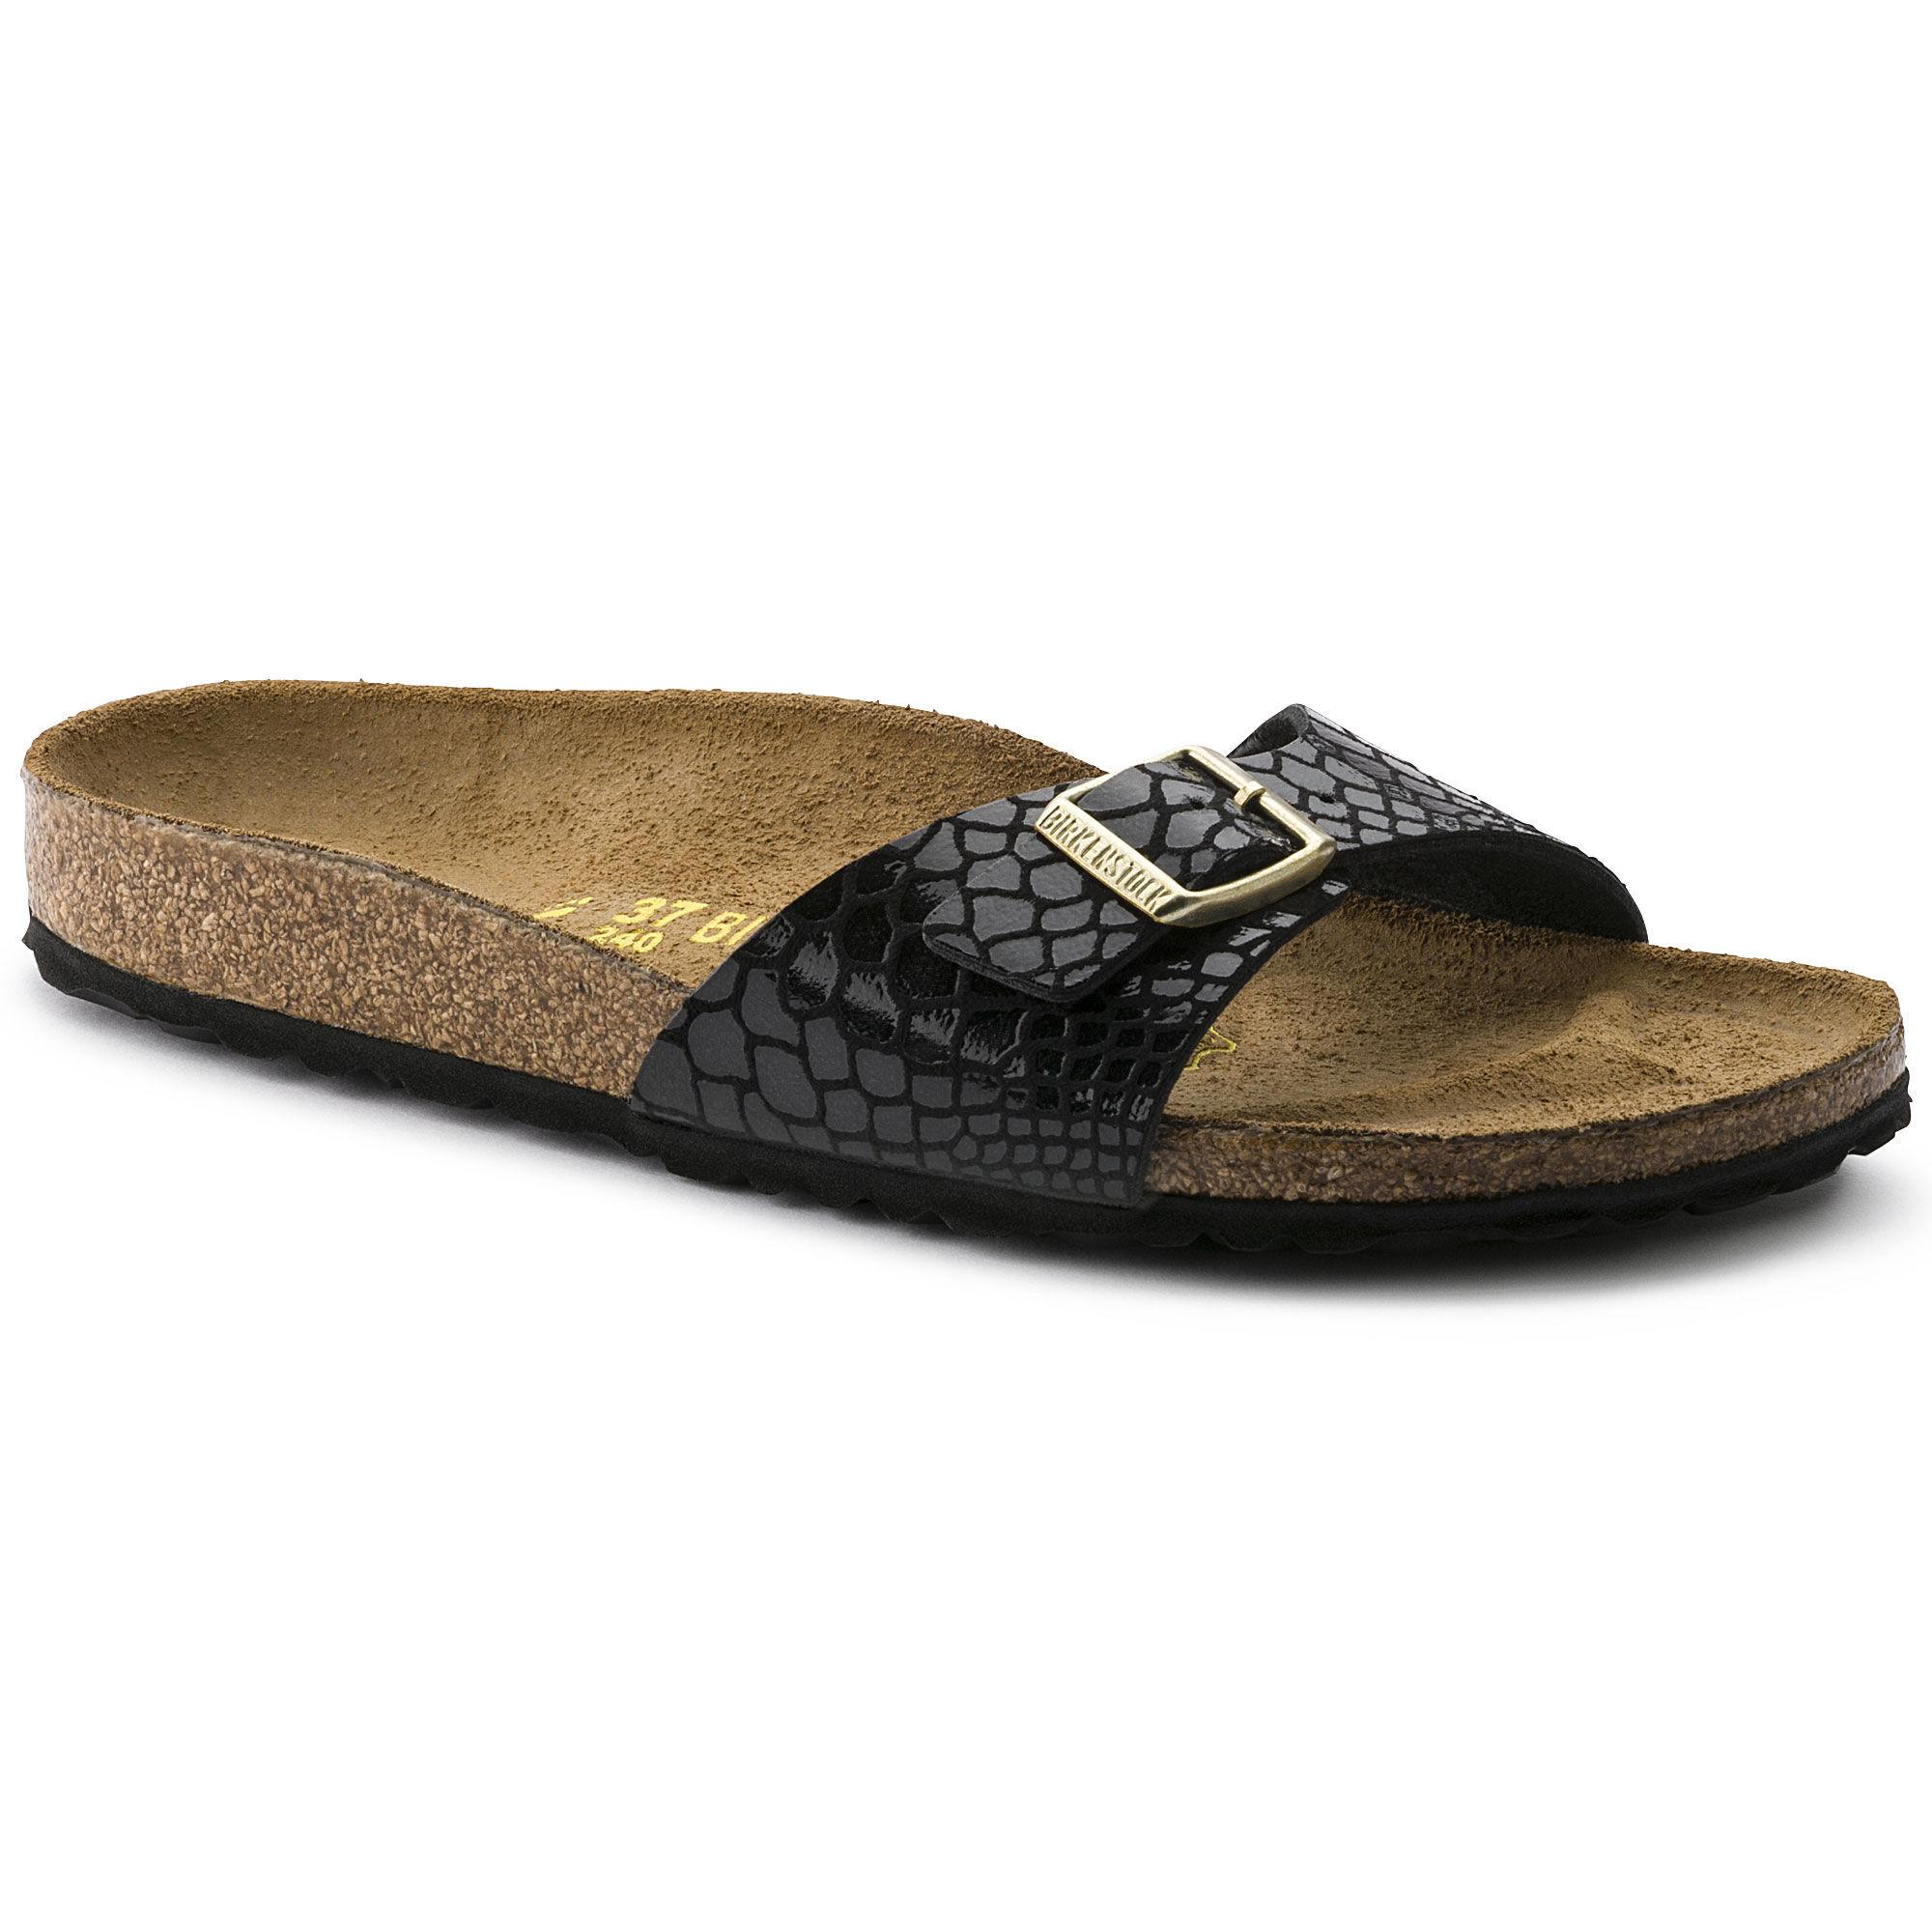 Birkenstock Women'S Arizona BF Shiny Snake Narrow Fit Sandal Black Multi-Black-7.5 Size 7.5 rlaYoFKc